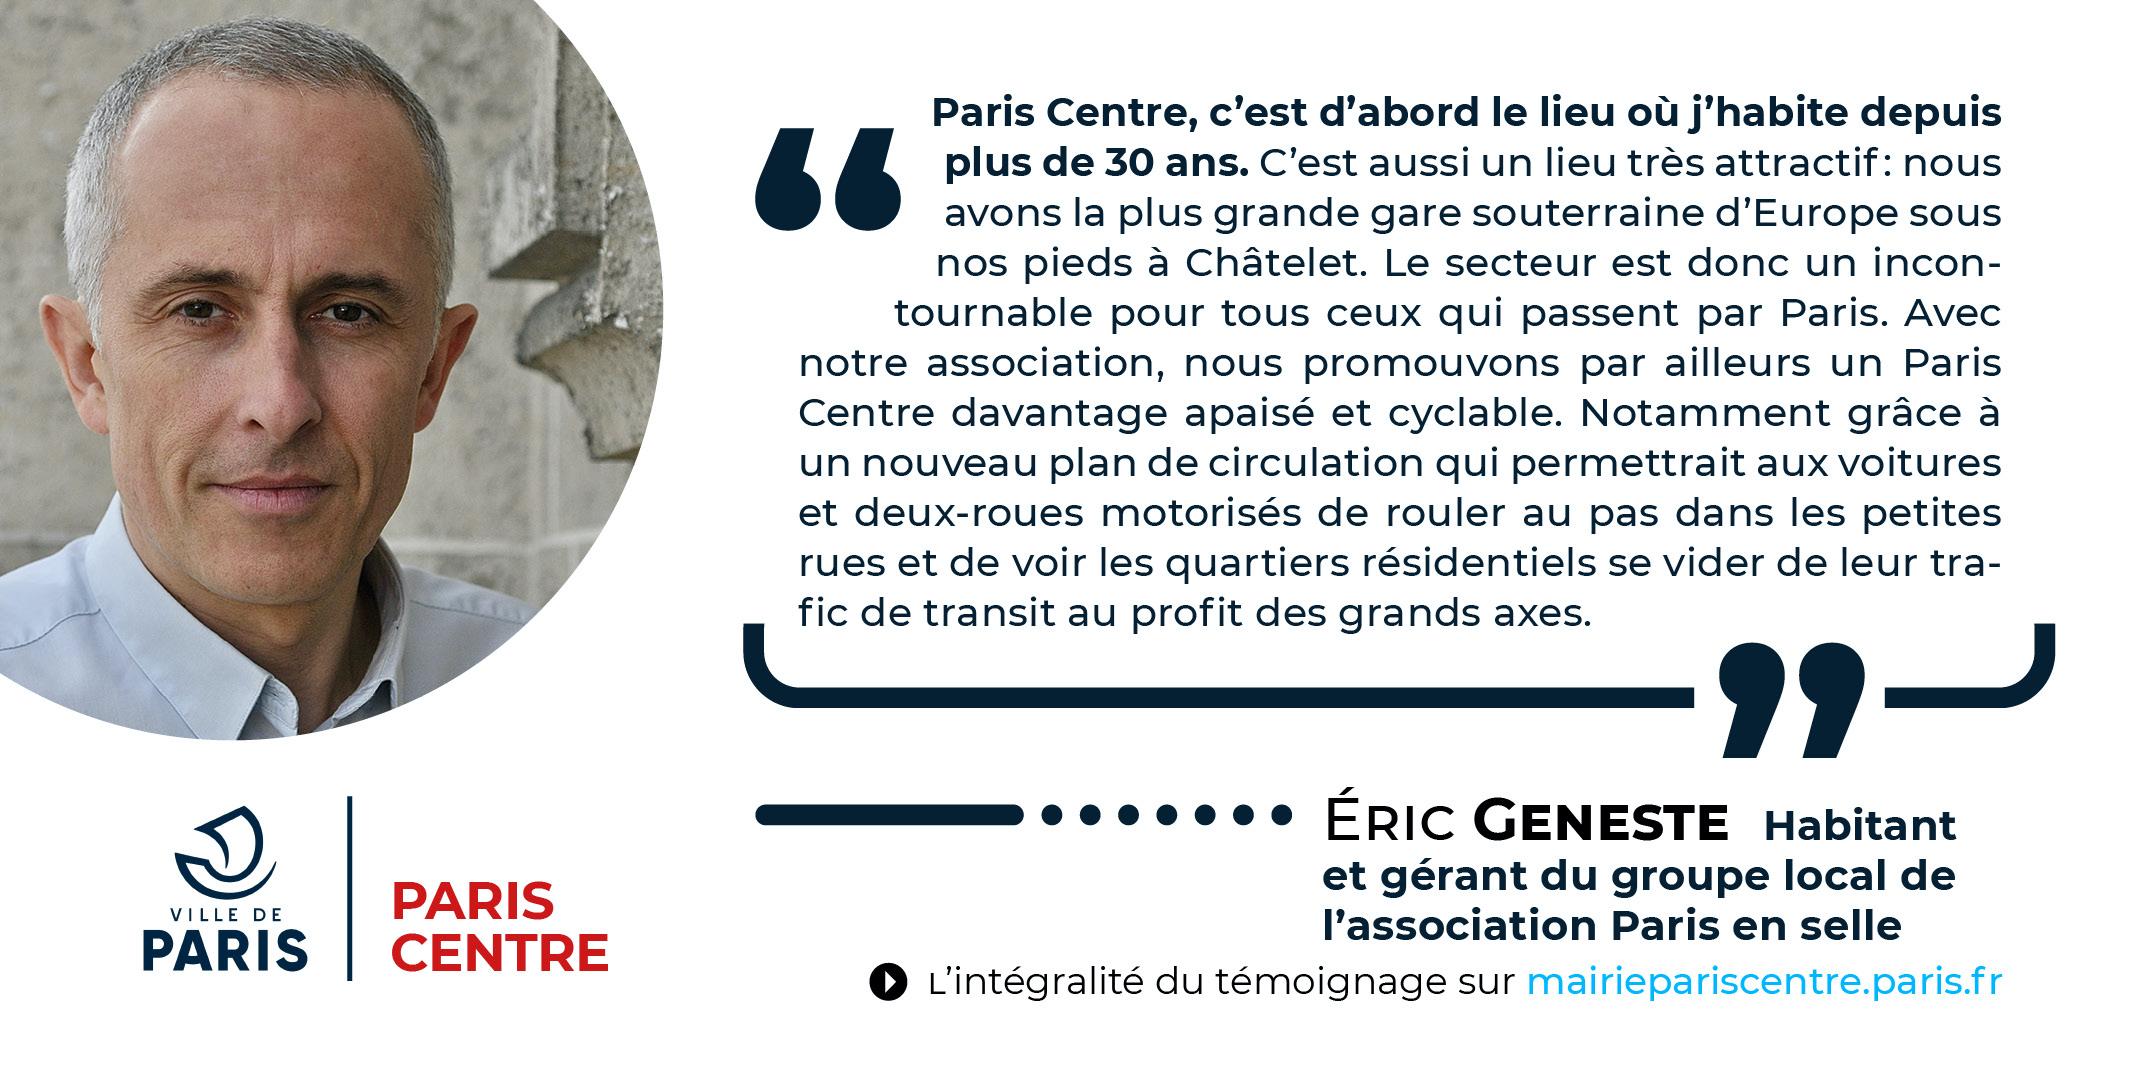 Éric Geneste